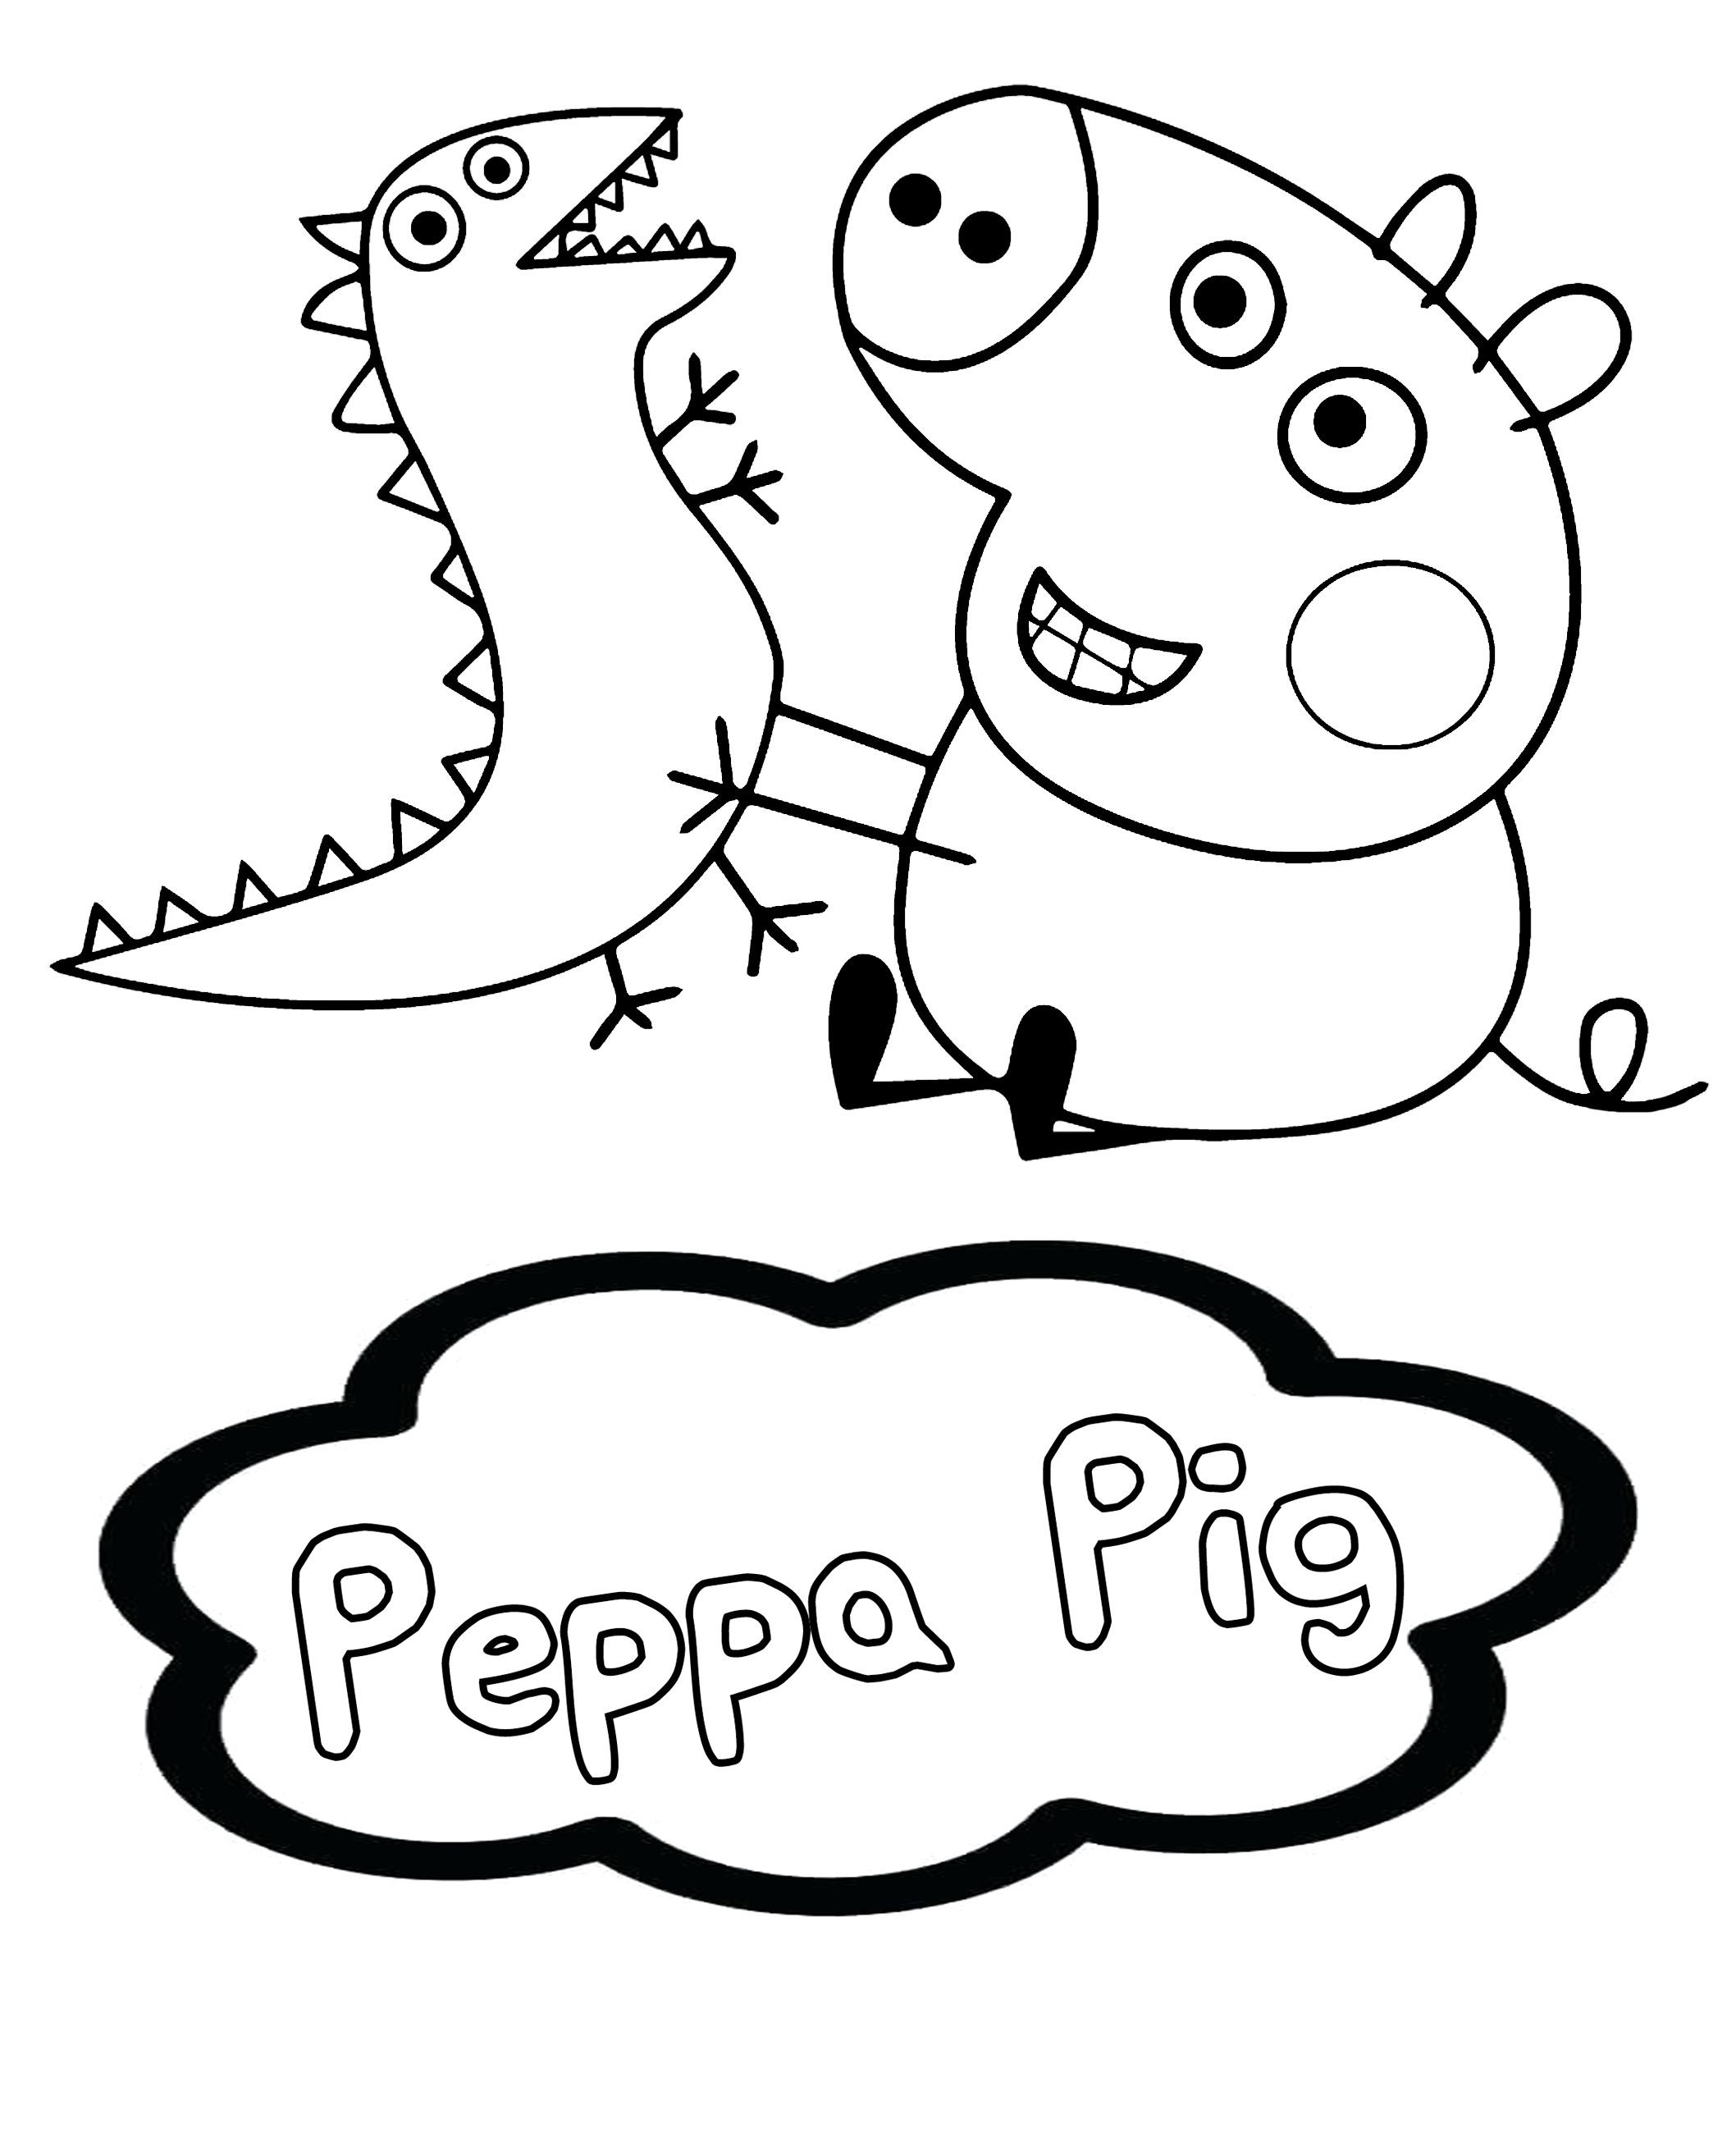 Coloring Dinosaurs Peppa Peppa Pig Pig Trex Coloring Dinosaurs Peppa Peppapig Pig Trex Cartoon Co Peppa Pig Peppa Pig Wallpaper Pig Wallpaper